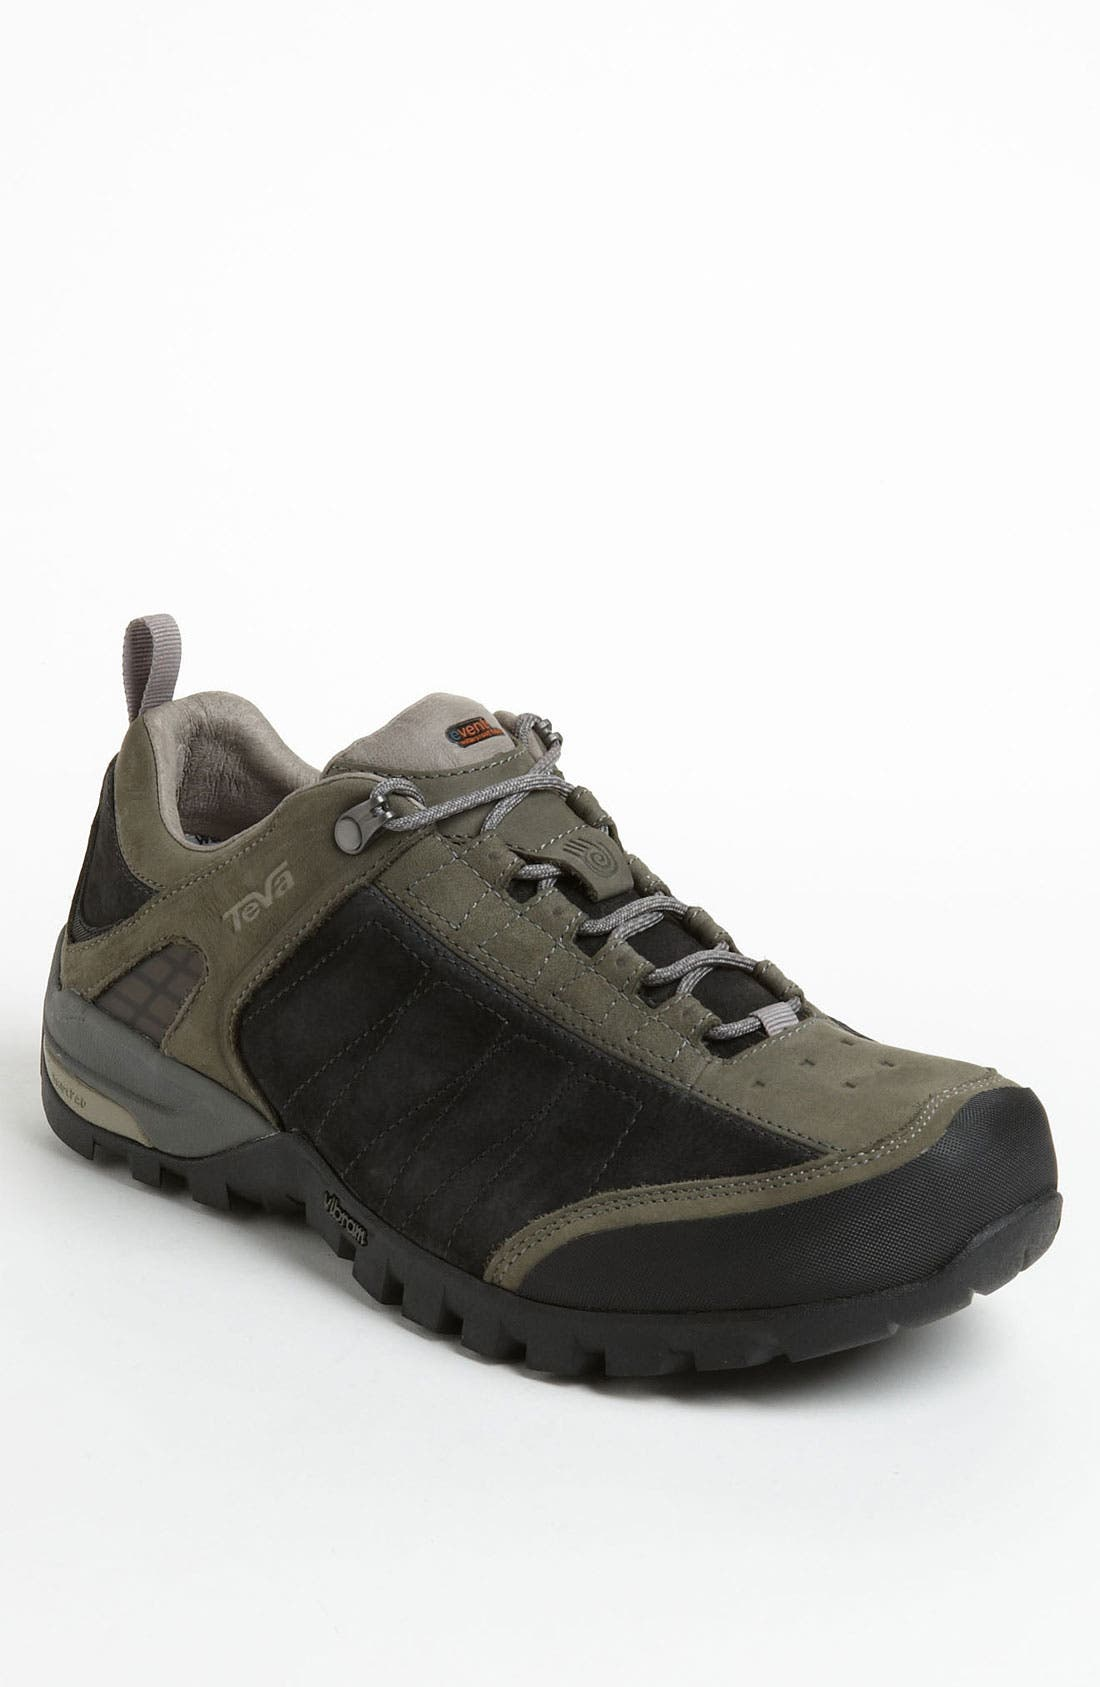 Alternate Image 1 Selected - Teva 'Riva eVent®' Hiking Shoe (Men)